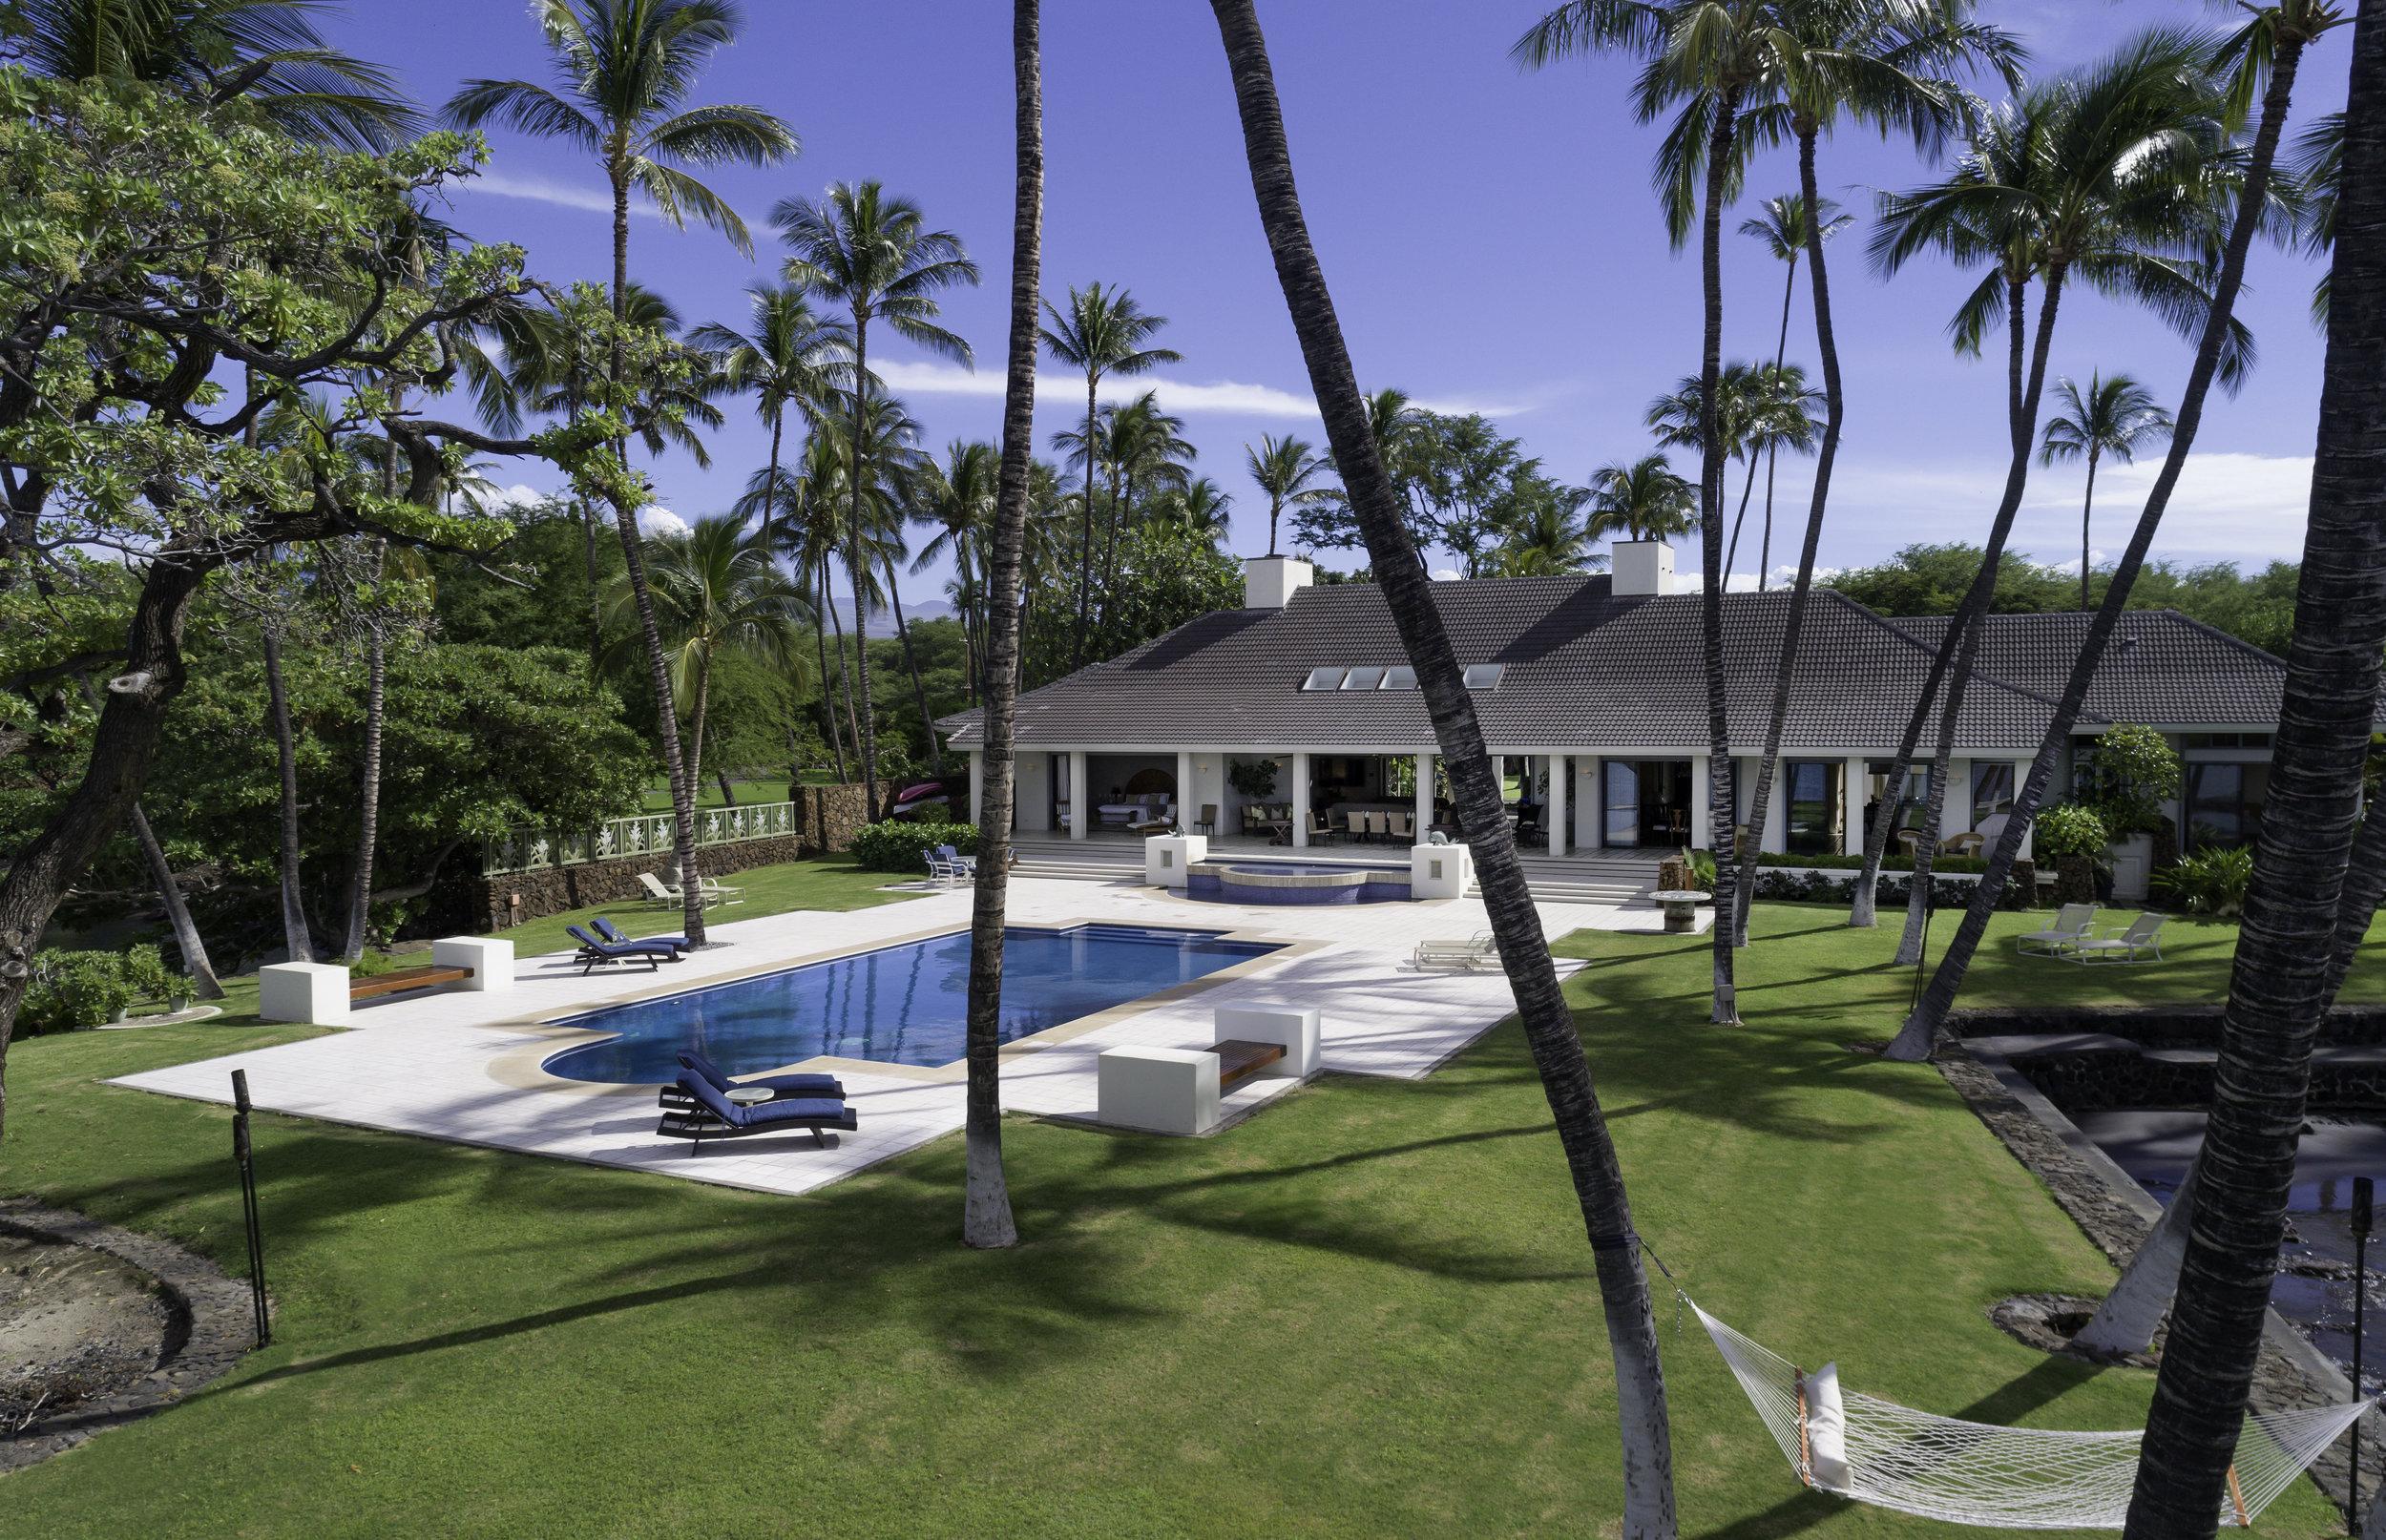 Honuala'i Estate | 69-1566 Puako Beach Drive |    $17.499 million    | 6 B   R / 7.5 BA    | 7,744    interior sq. ft.    | 1.16 acre lot |    MLS #626730